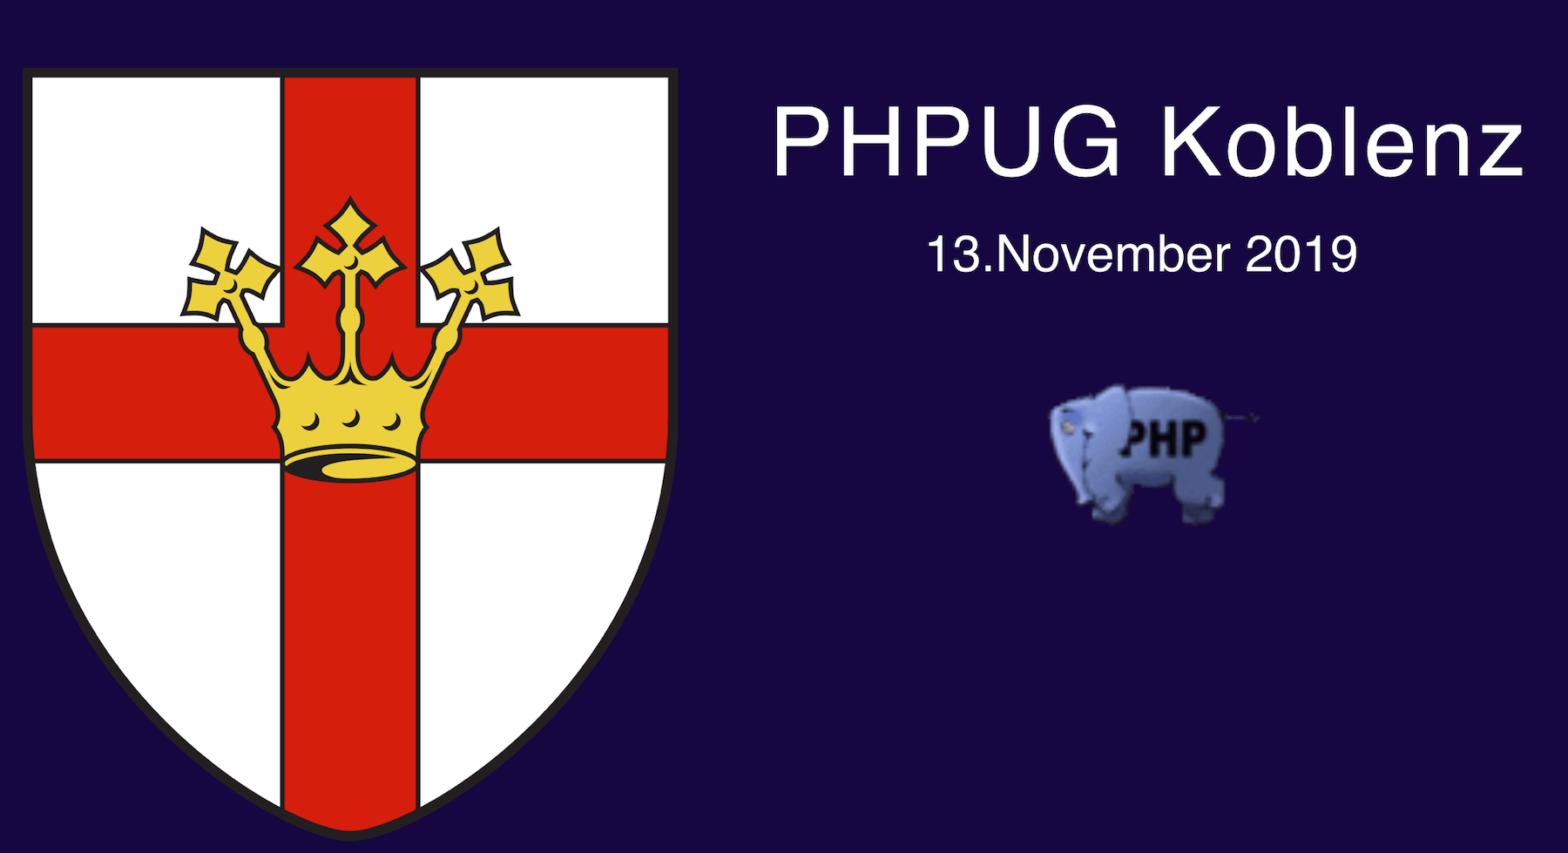 PHPUG Koblenz, November 2019